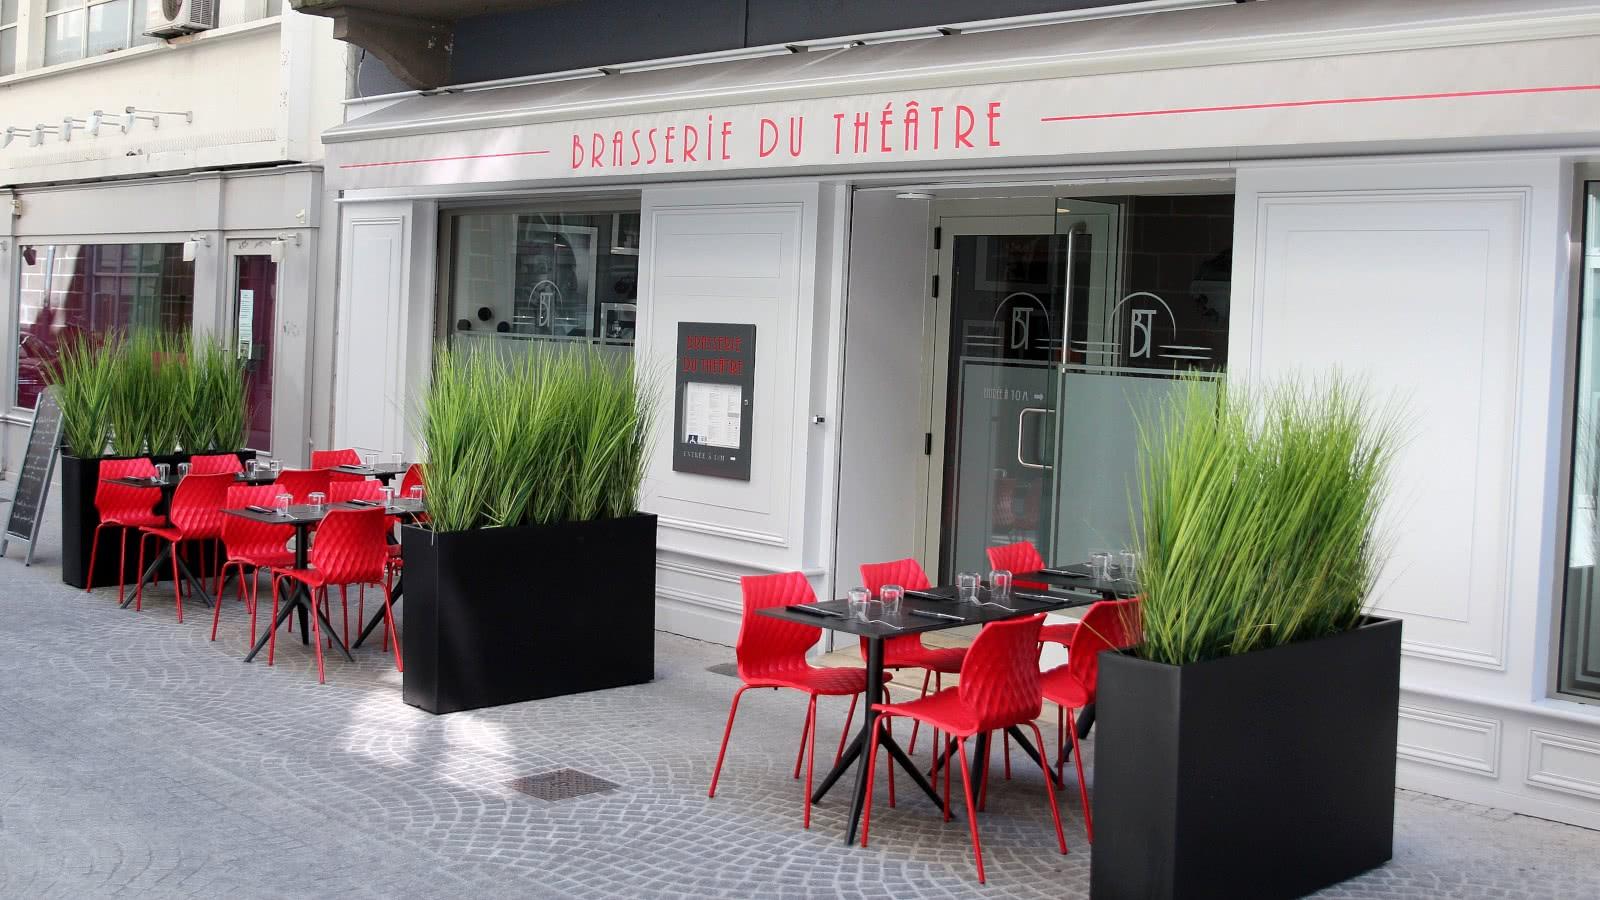 © Brasserie du théâtre